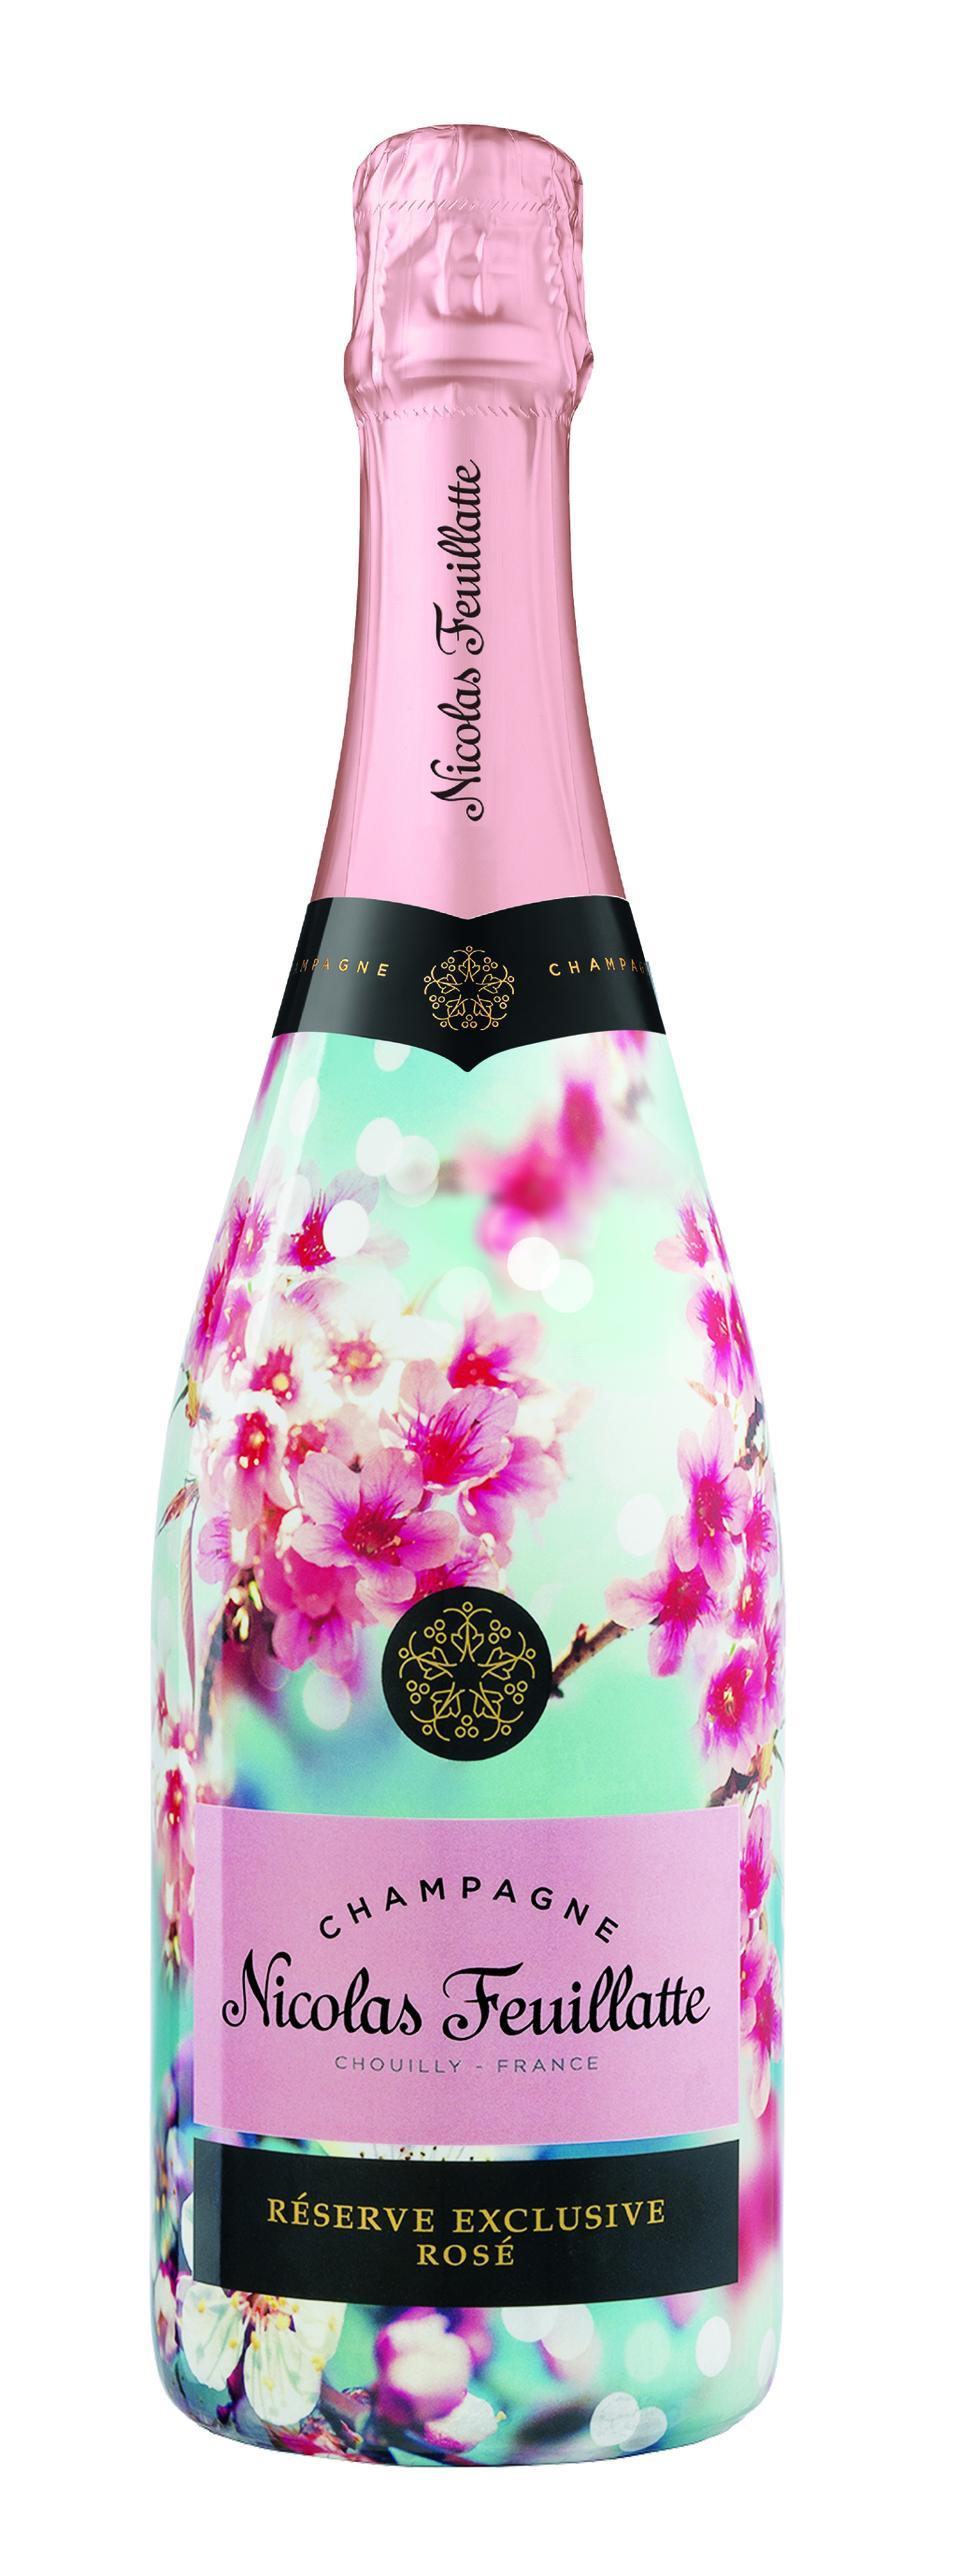 Nicolas Feuillatte pink Champagne